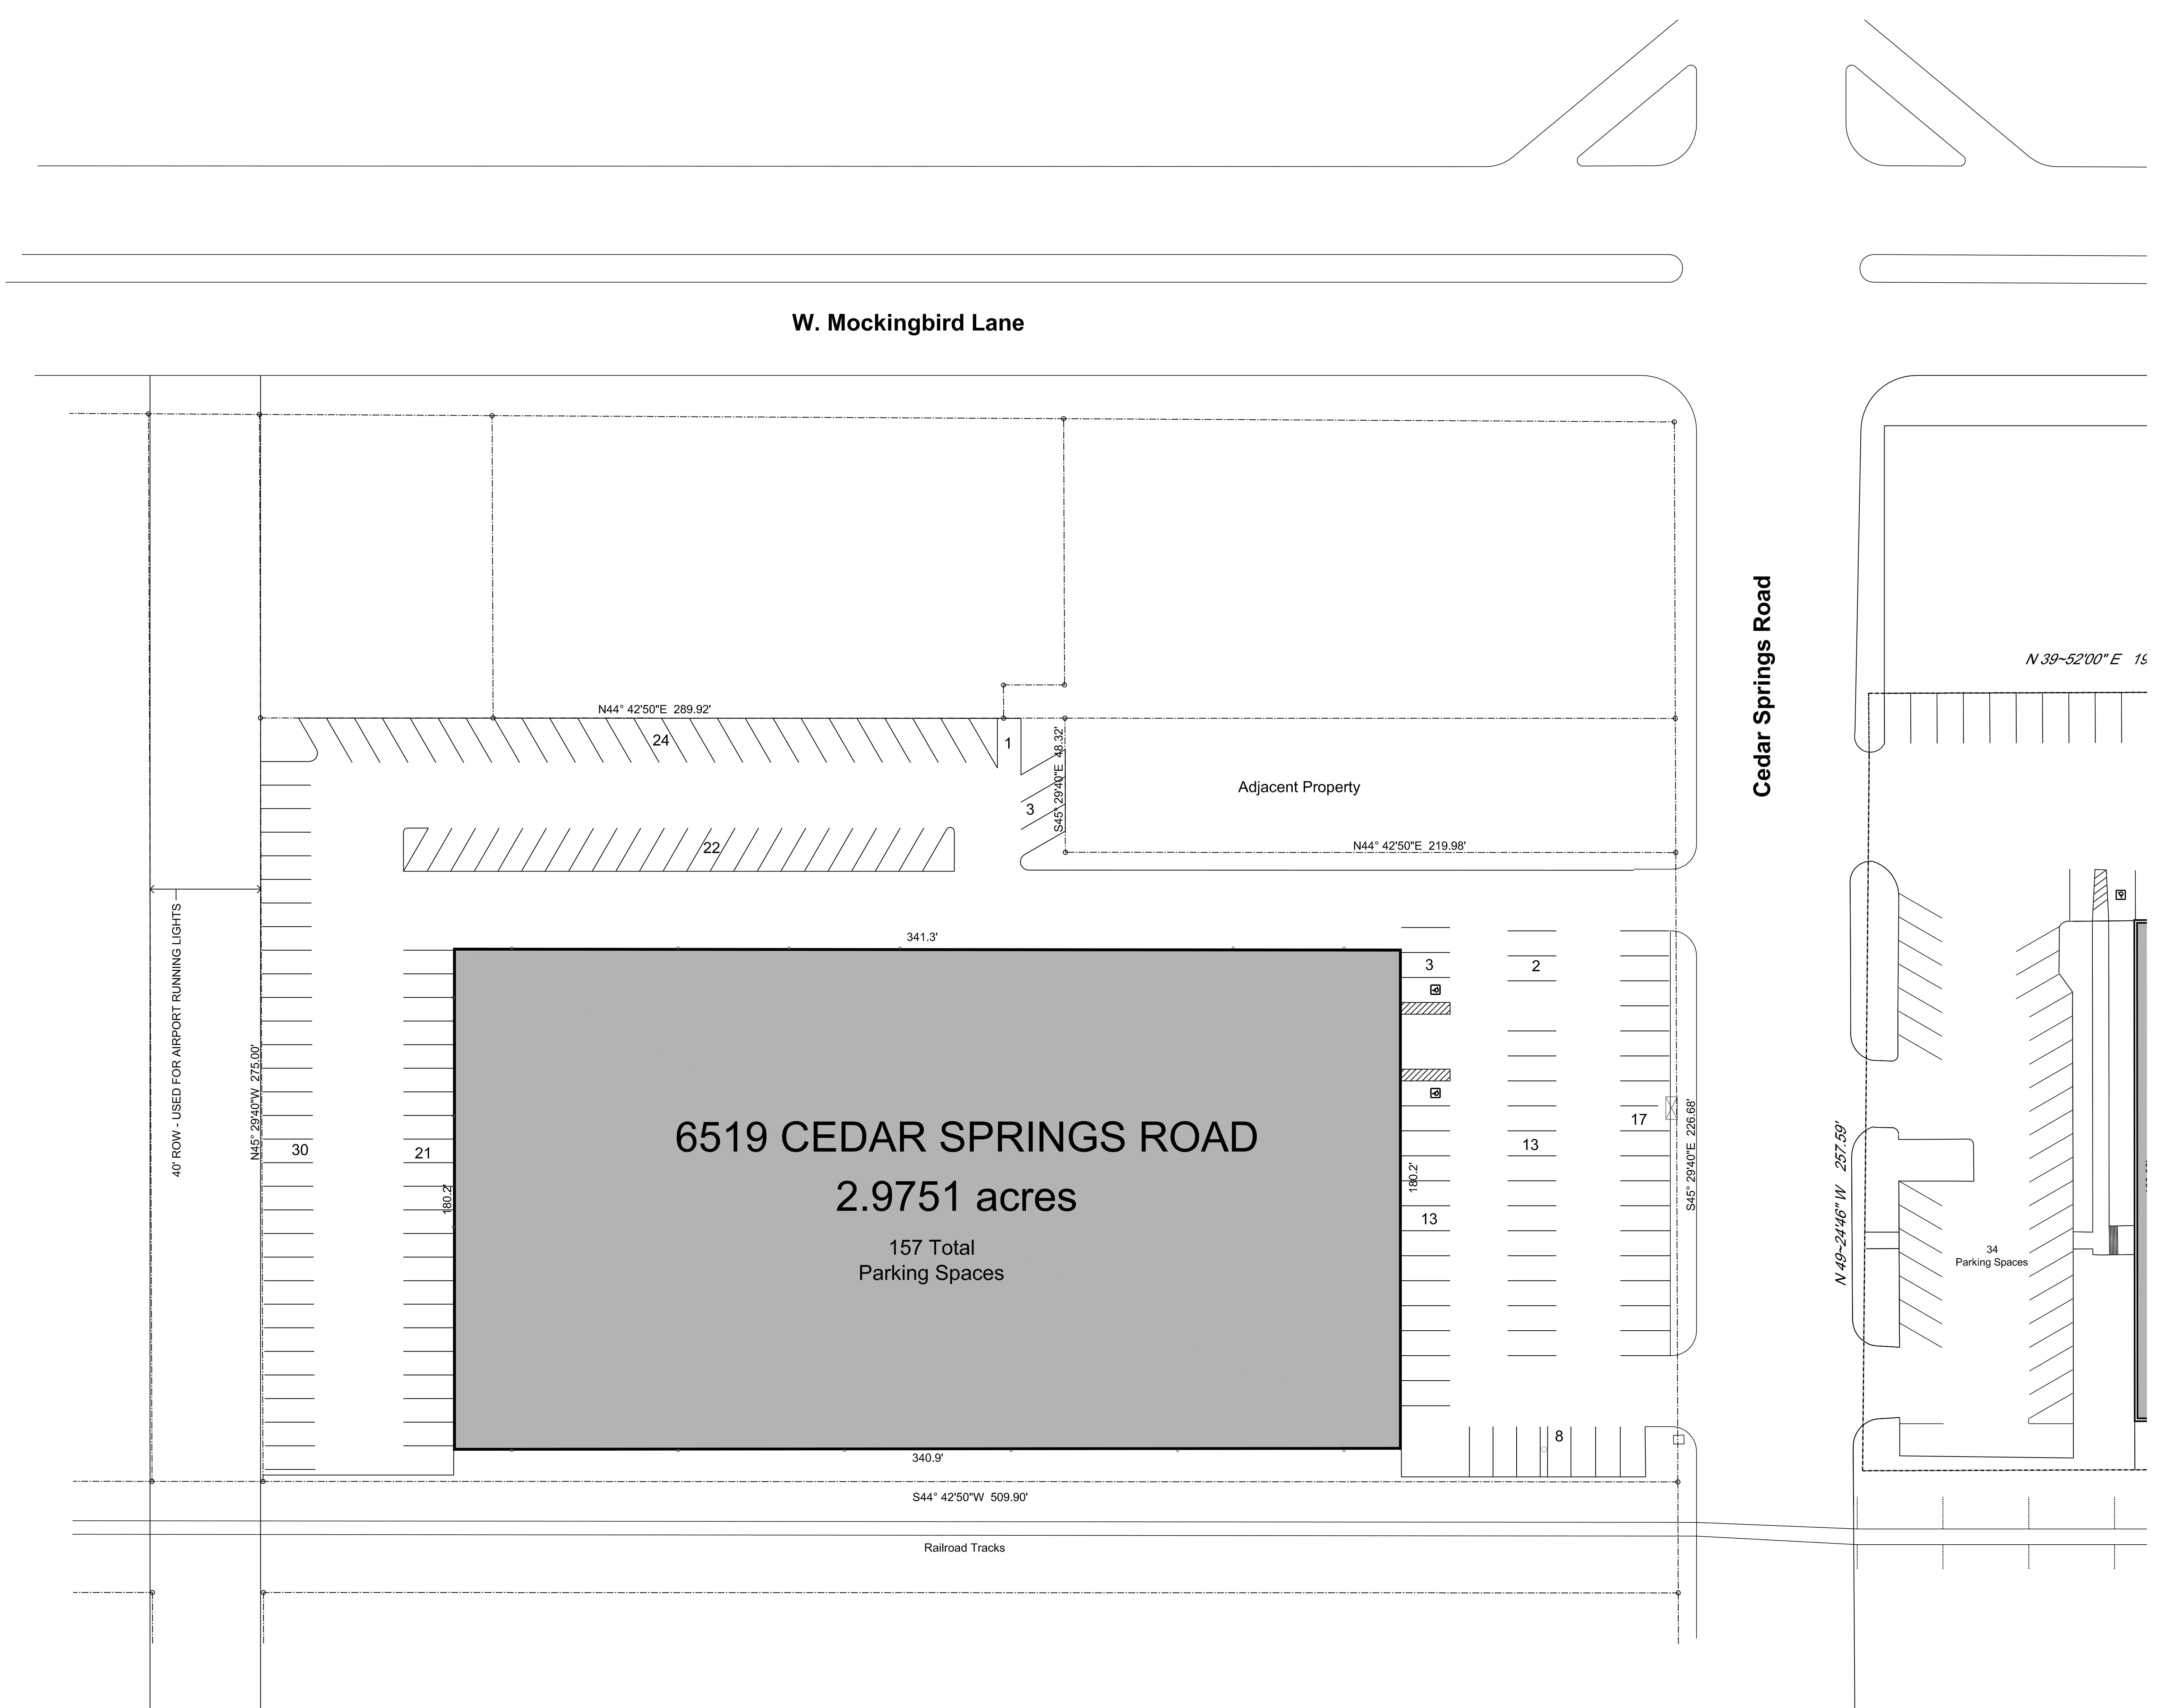 6519 Cedar Springs Rd: site plan